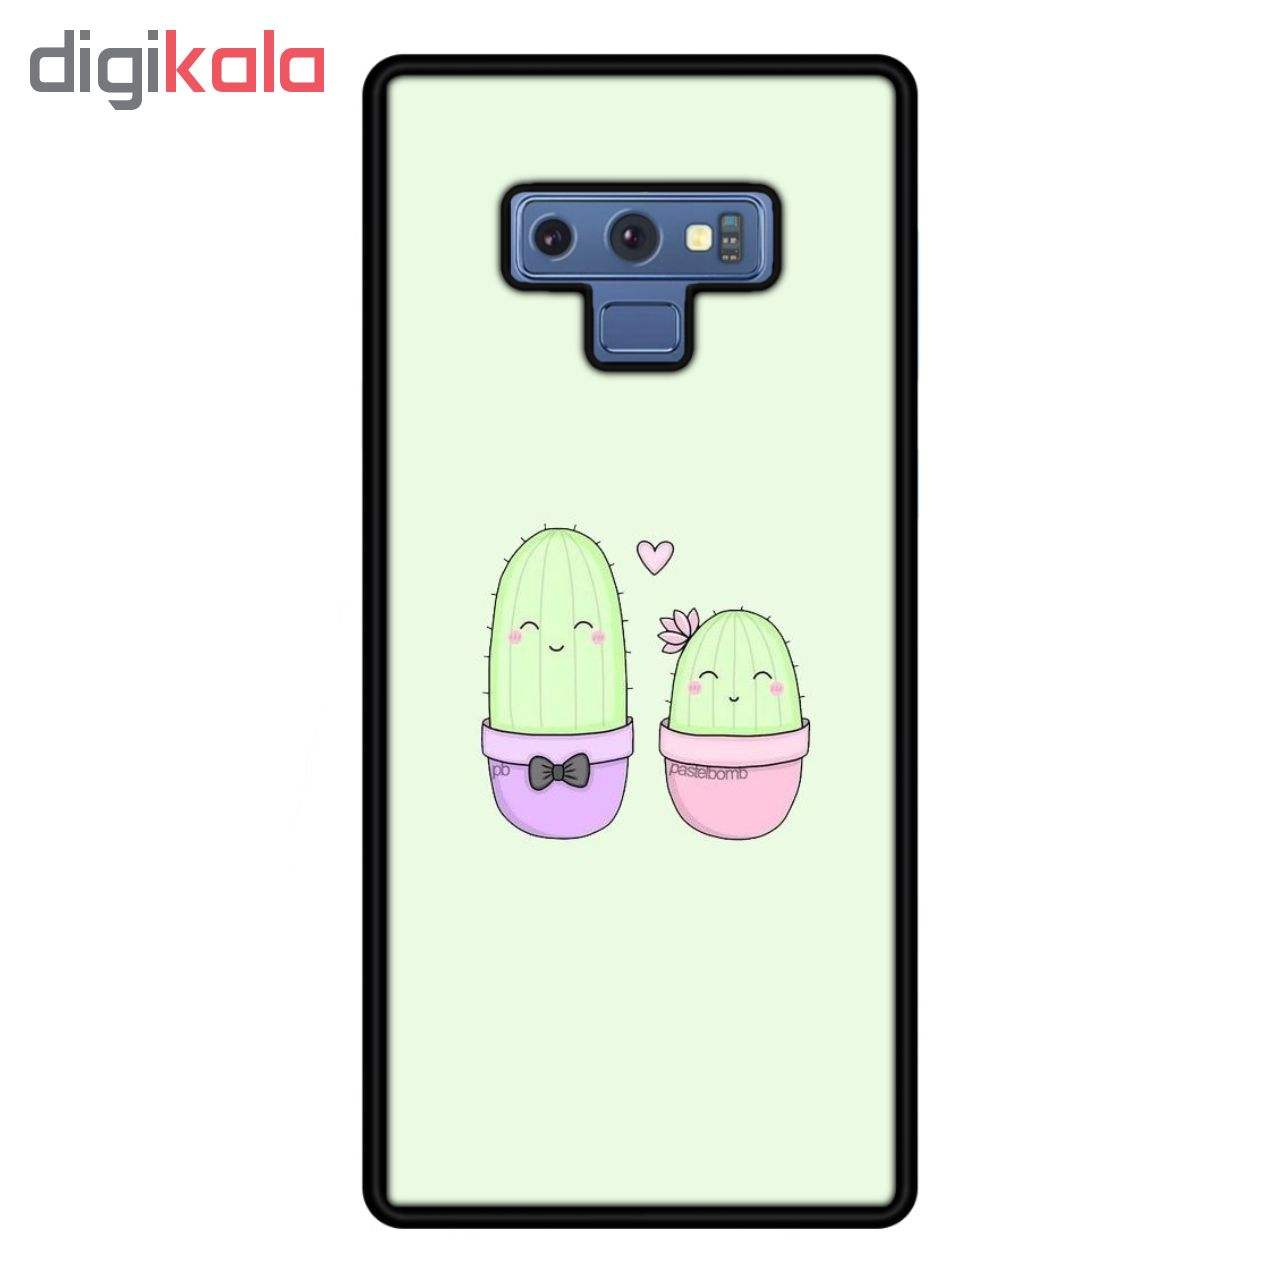 کاور آکام مدل AN91179 مناسب برای گوشی موبایل سامسونگ Galaxy Note 9 main 1 1